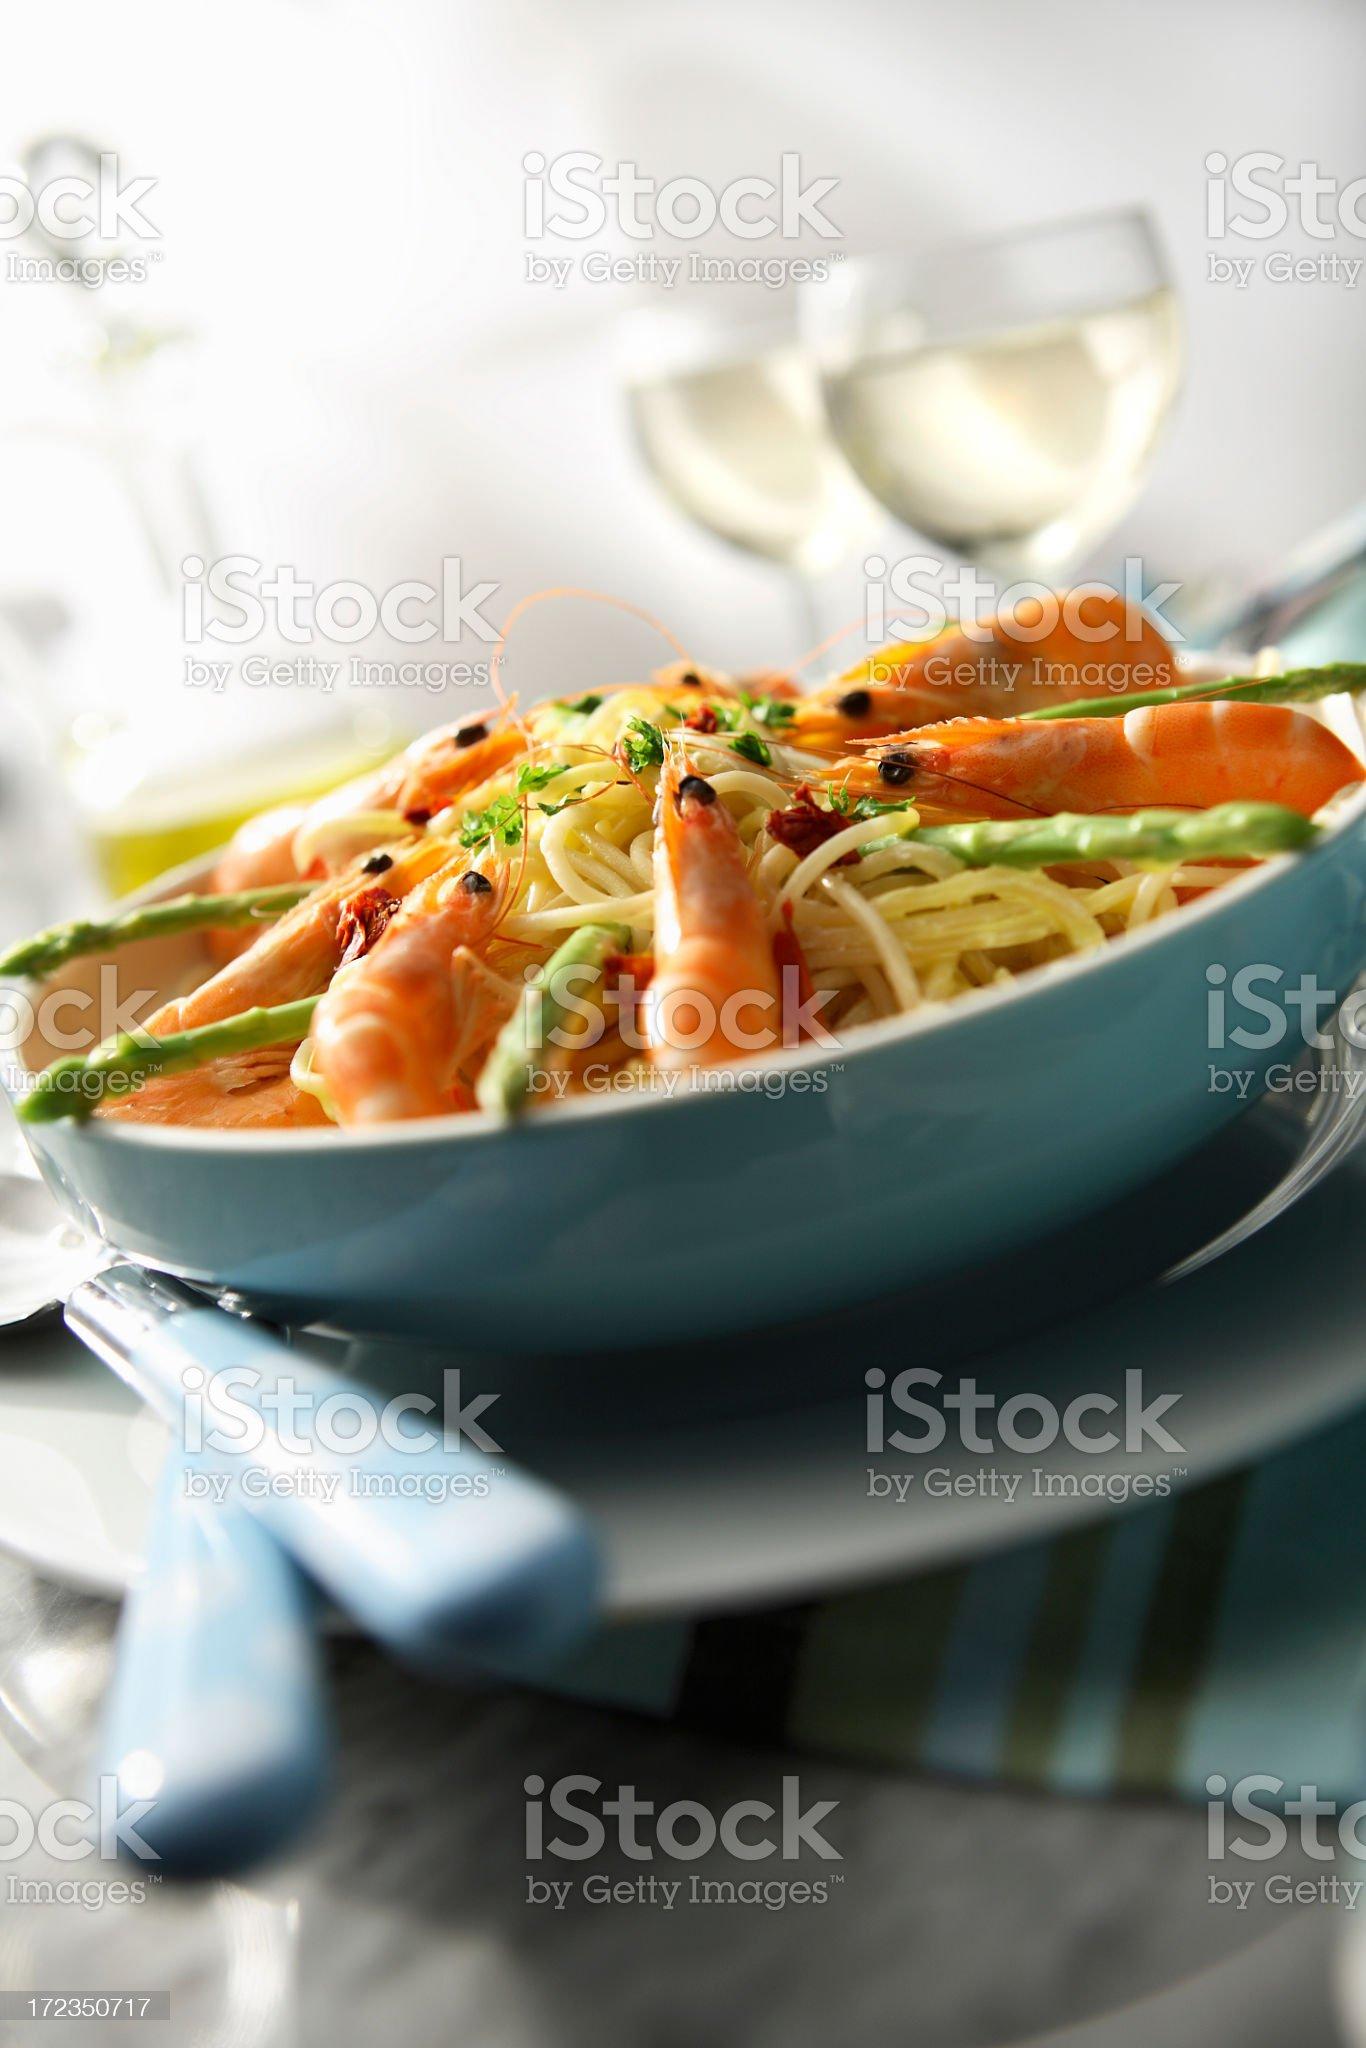 Italian Stills: Spaghetti with Shrimps and Asparagus royalty-free stock photo